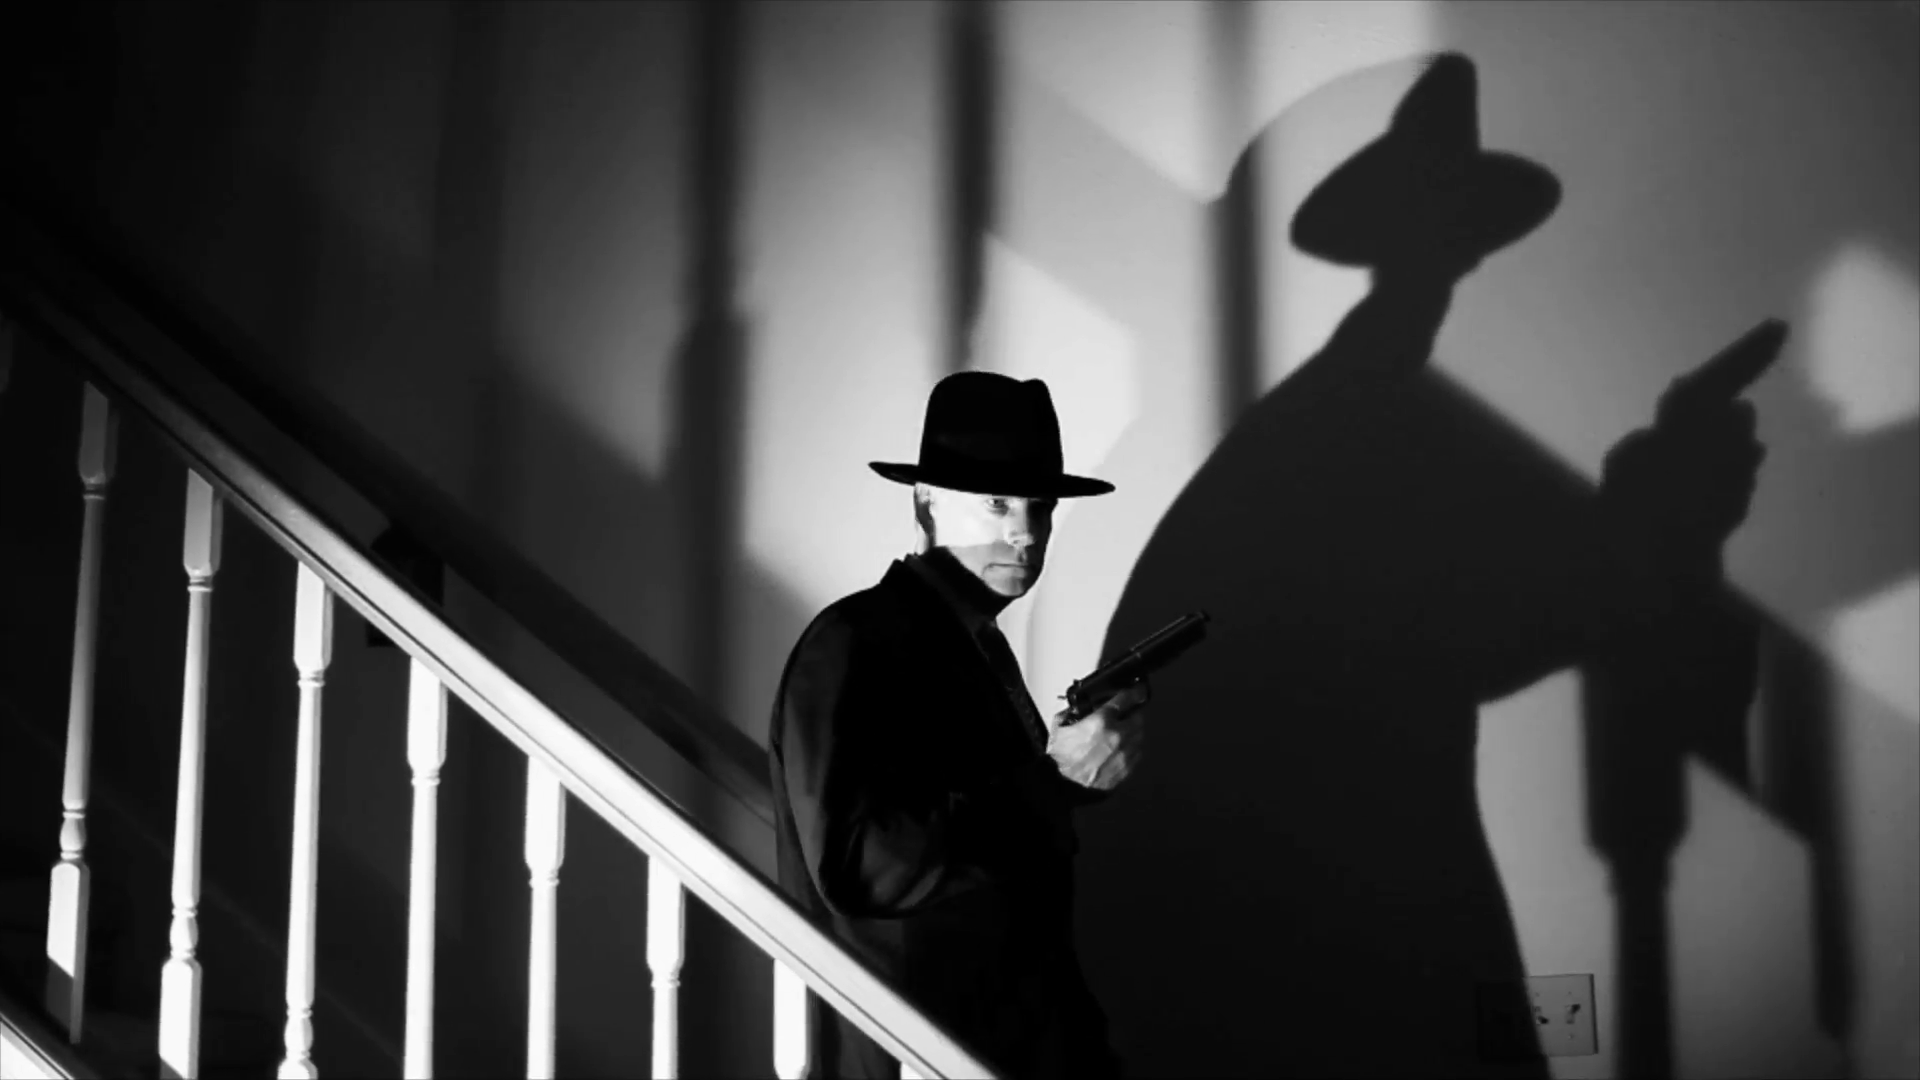 film-noir-gunman-walking-downstairs_ekec4cveg__F0000